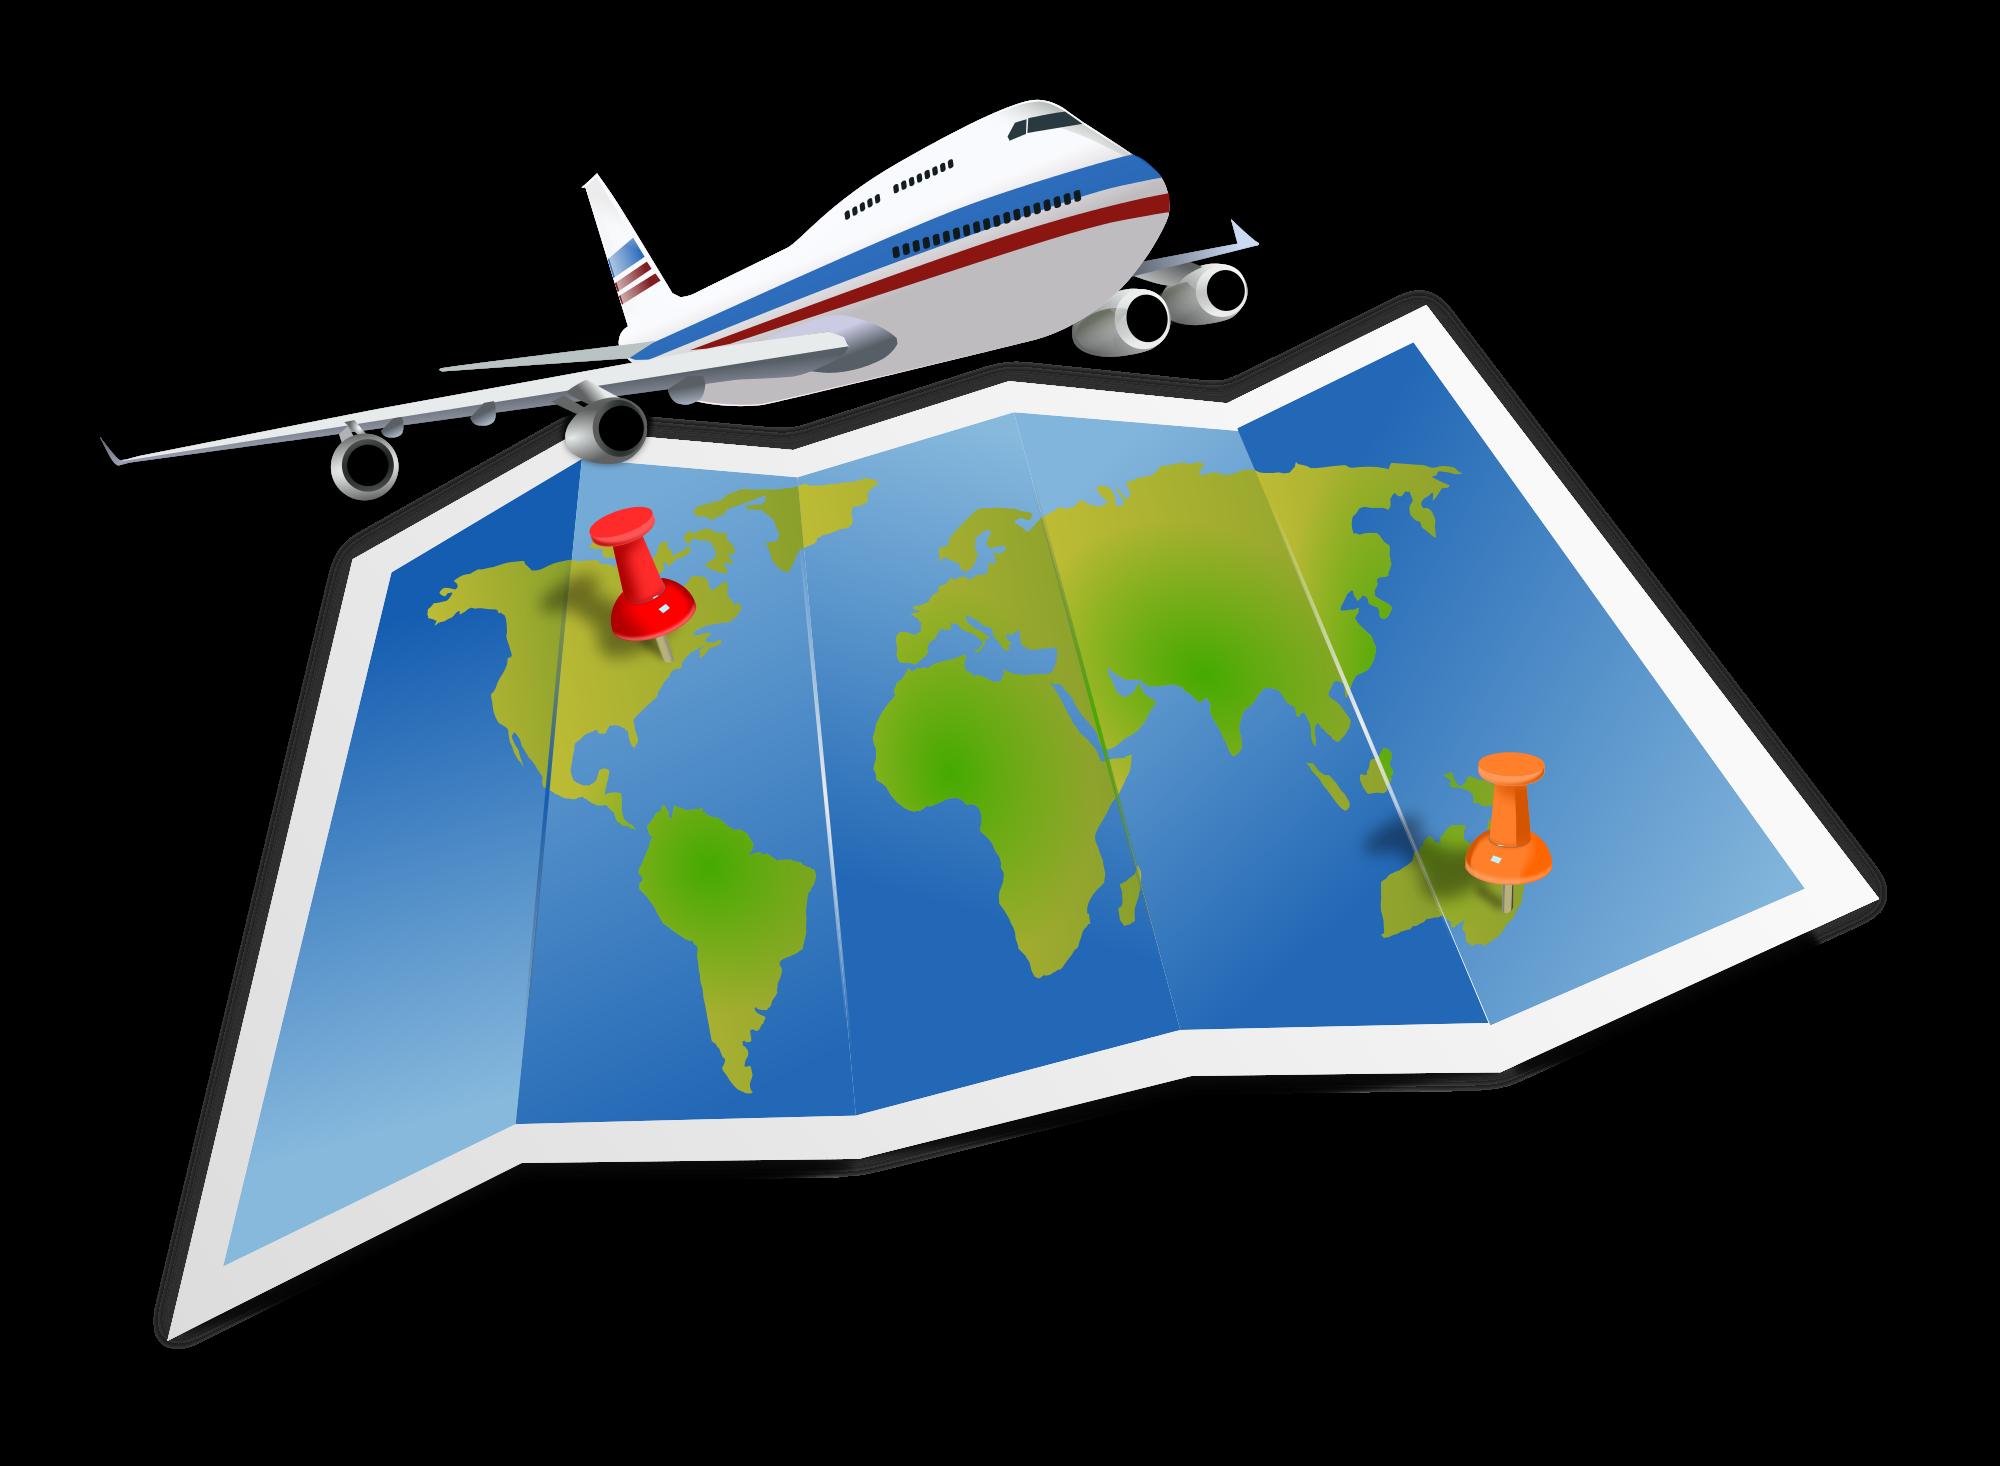 Clipart world world traveler. To travel or not